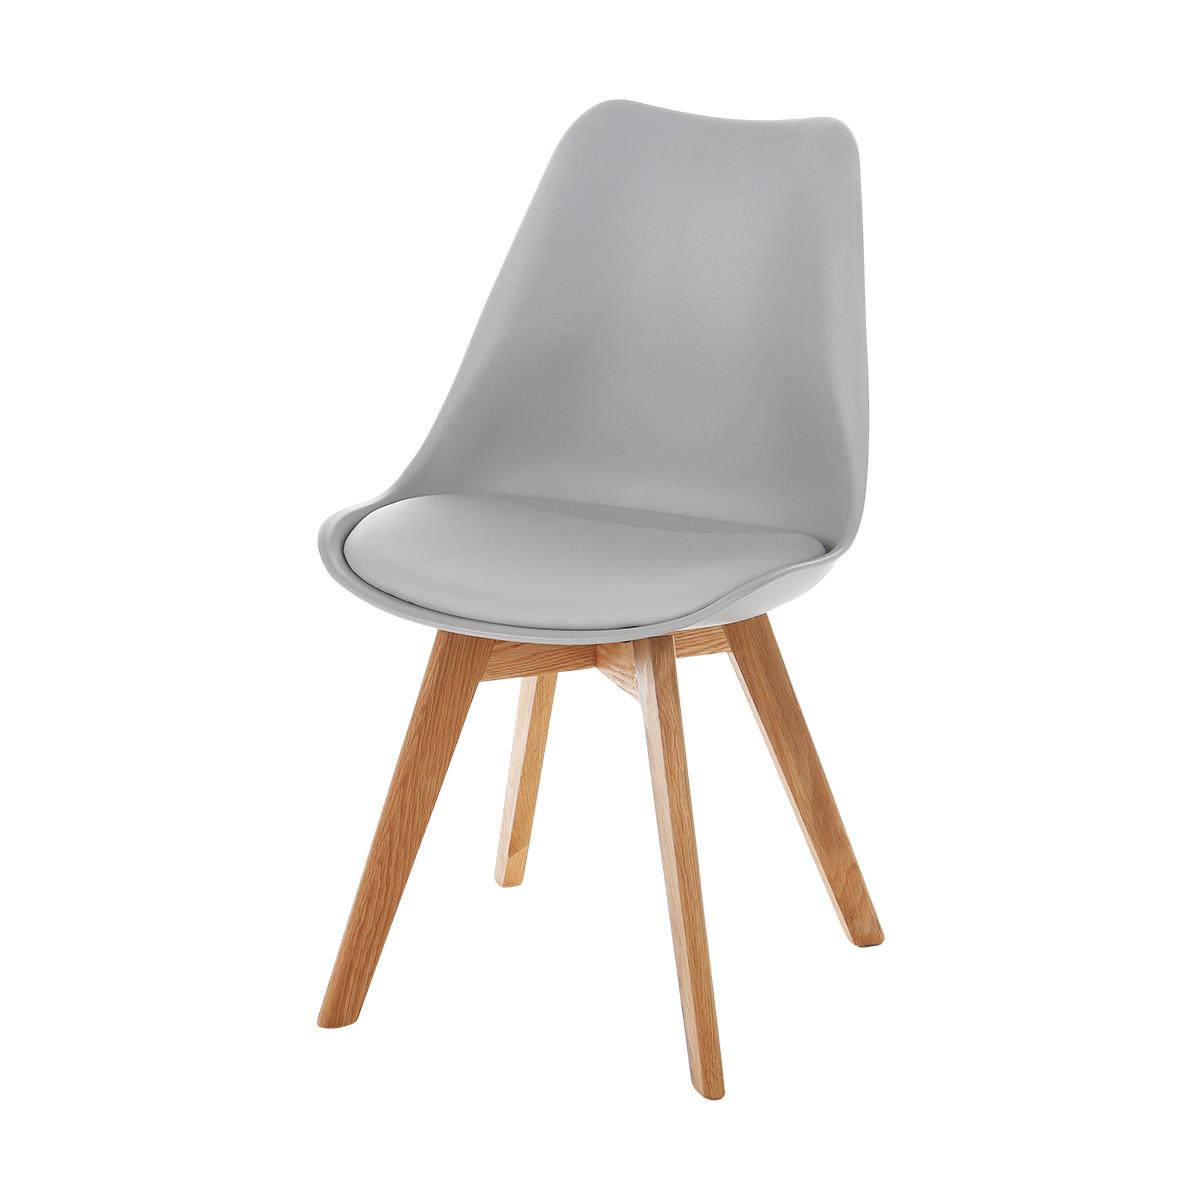 Charles jacob chair grey oak legs replica austin furniture warehouse